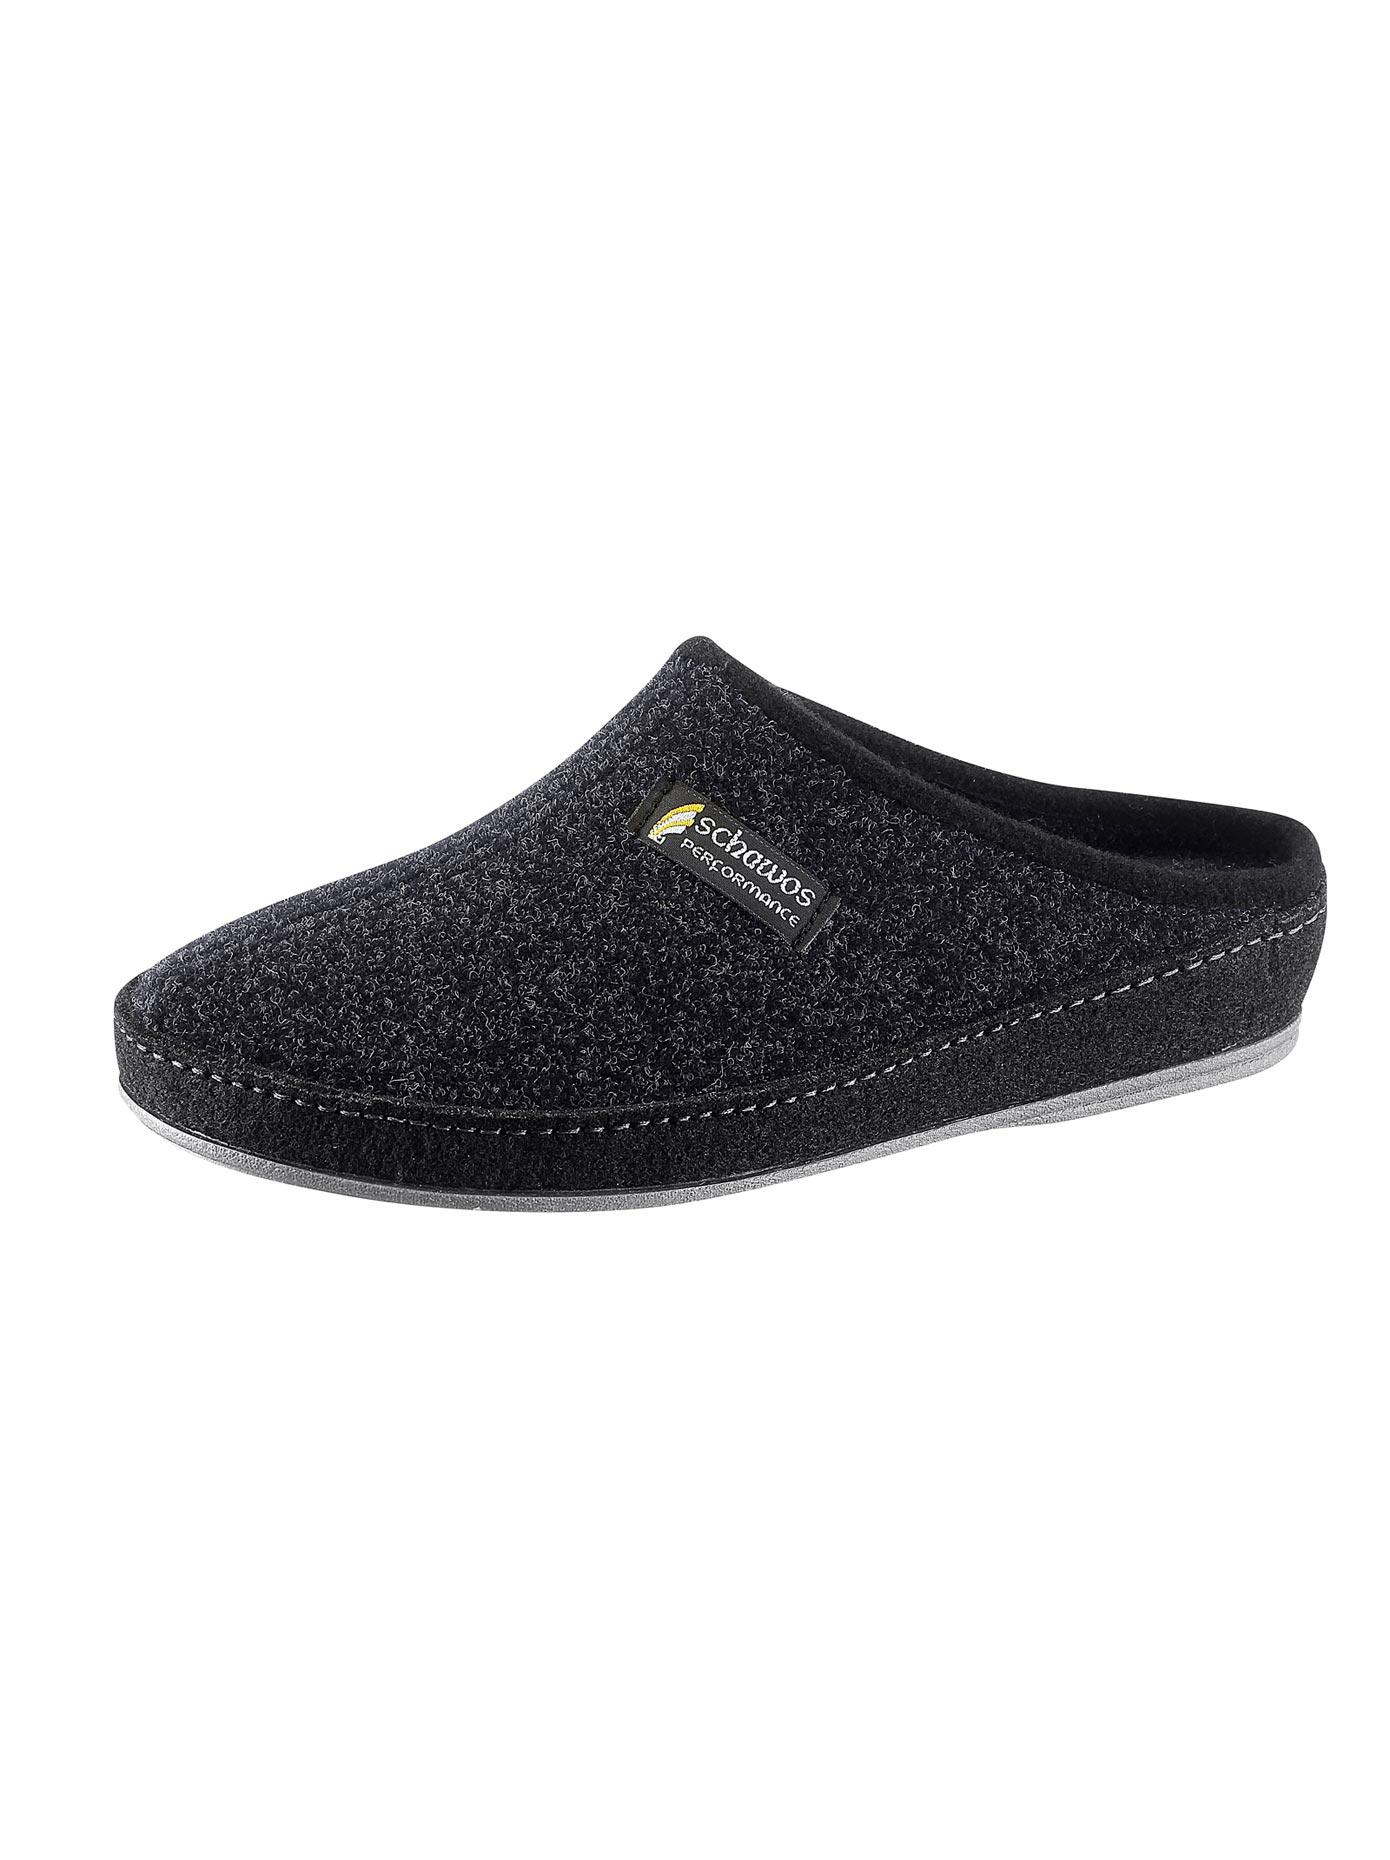 Schawos Pantoffel mit rutschhemmender Synthetik-Laufsohle | Schuhe > Hausschuhe | Classic